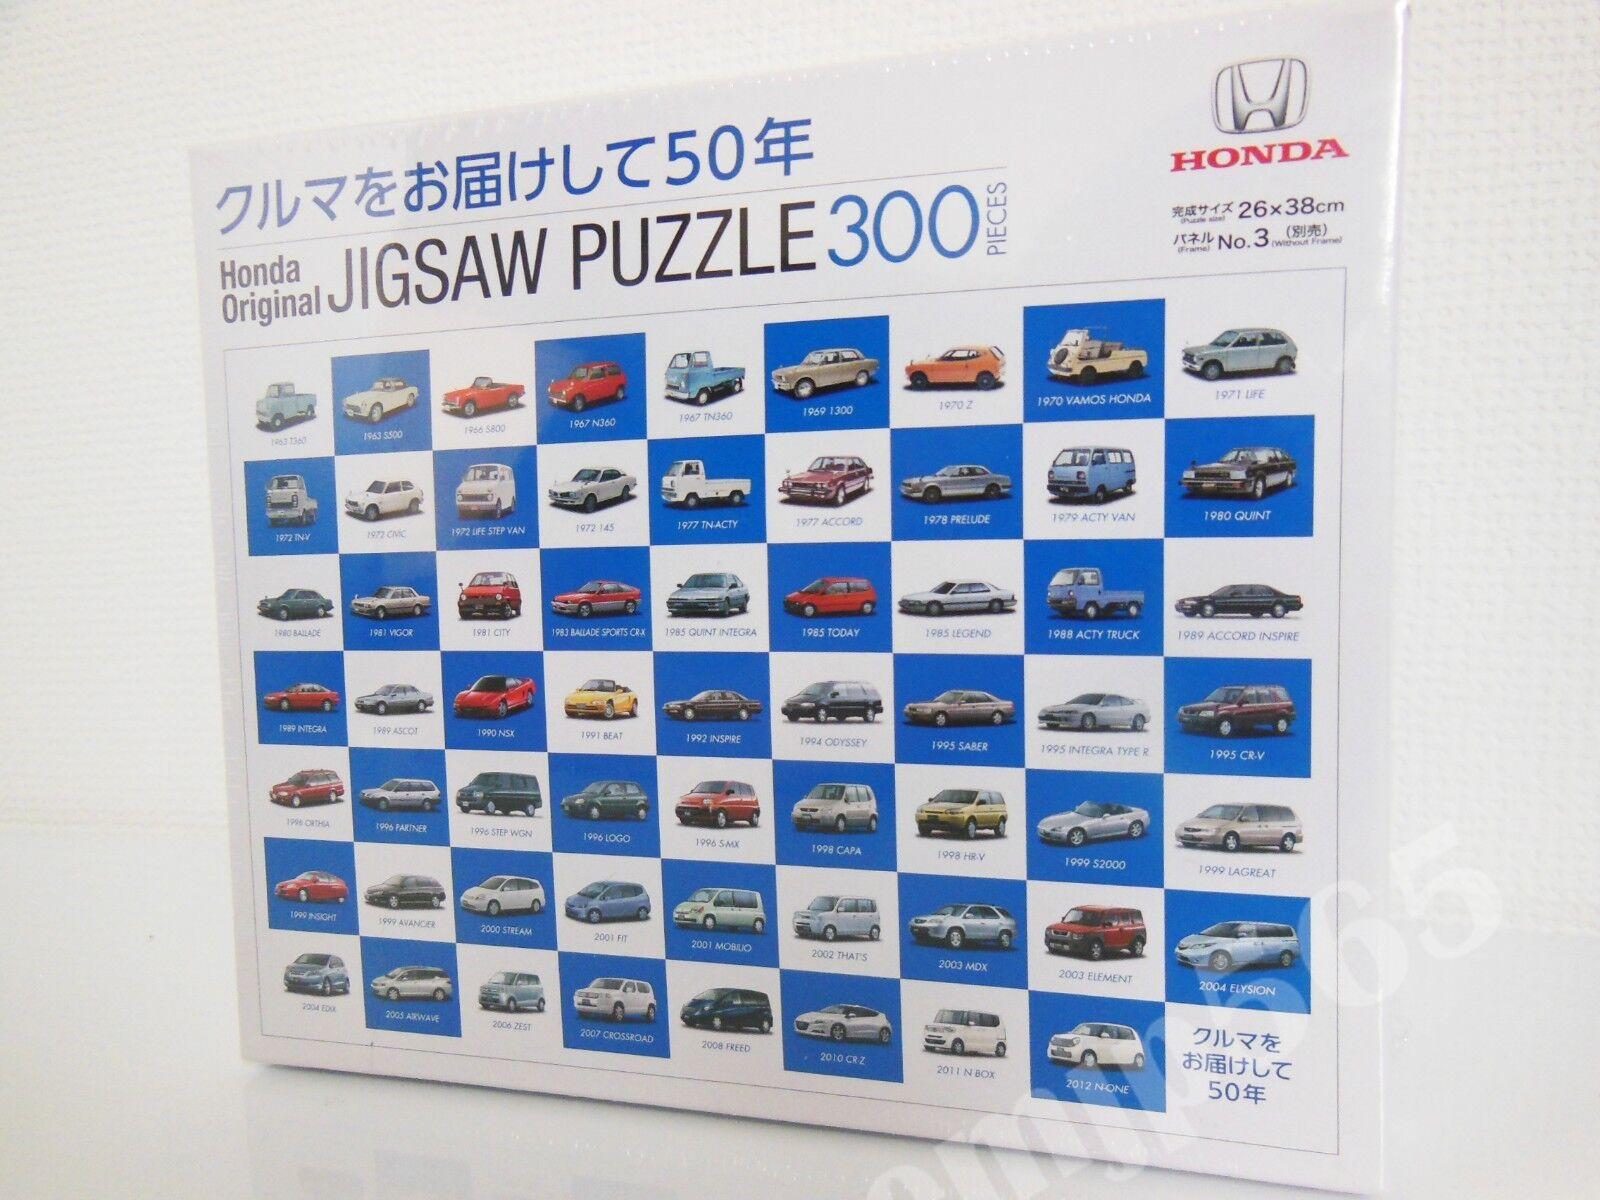 Honda Original JIGSAW PUZZLE 300 PIECES.50th Anniversary.Not for sale.JAPAN.RARE